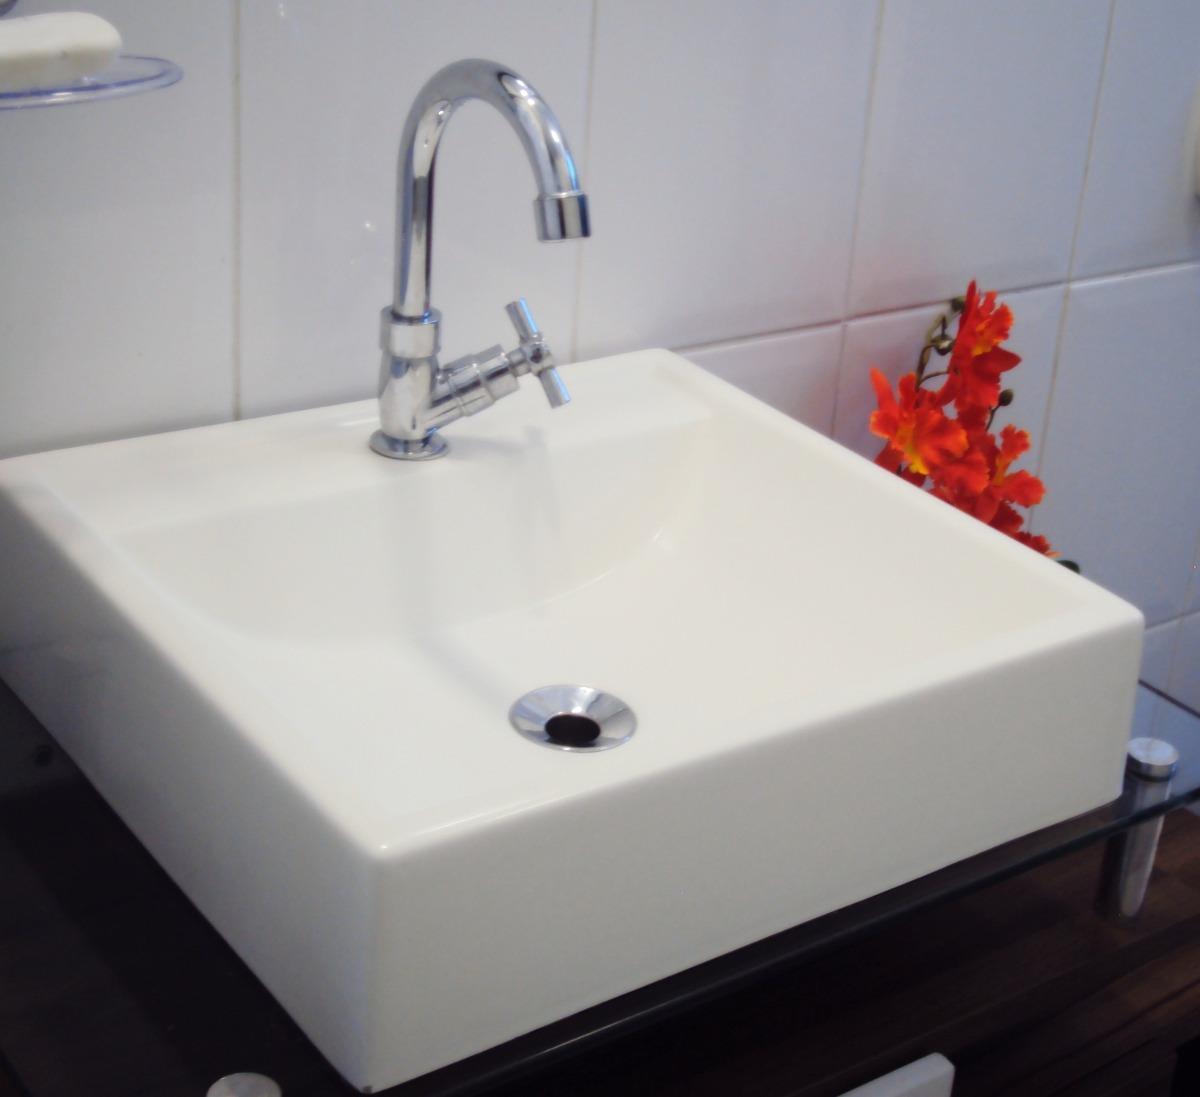 Cuba De Apoio Tendência Lavatório Para Banheiro E Lavabo  R$ 79,90 em Merc -> Cuba De Apoio Para Banheiro Eternit Mileto